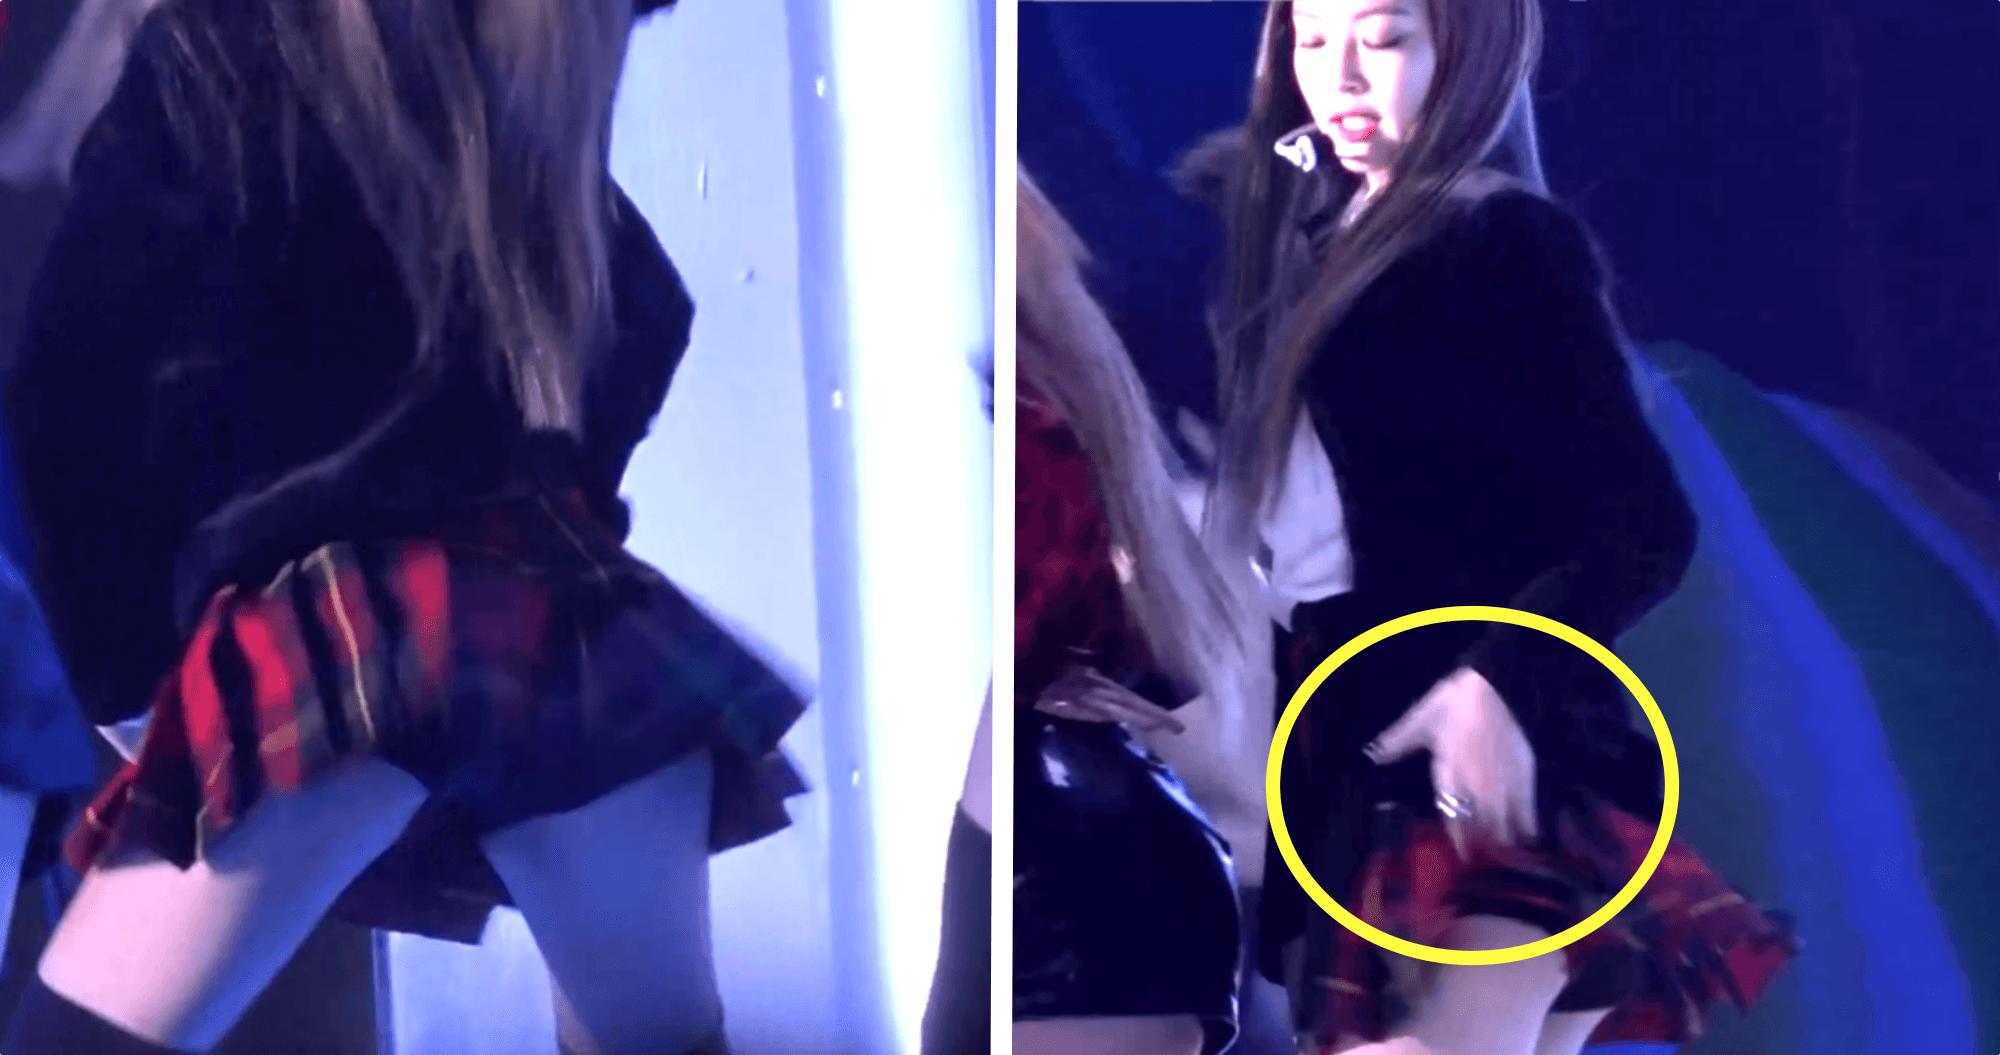 BLACKPINK Jennie Performs In Dangerously Short Skirt